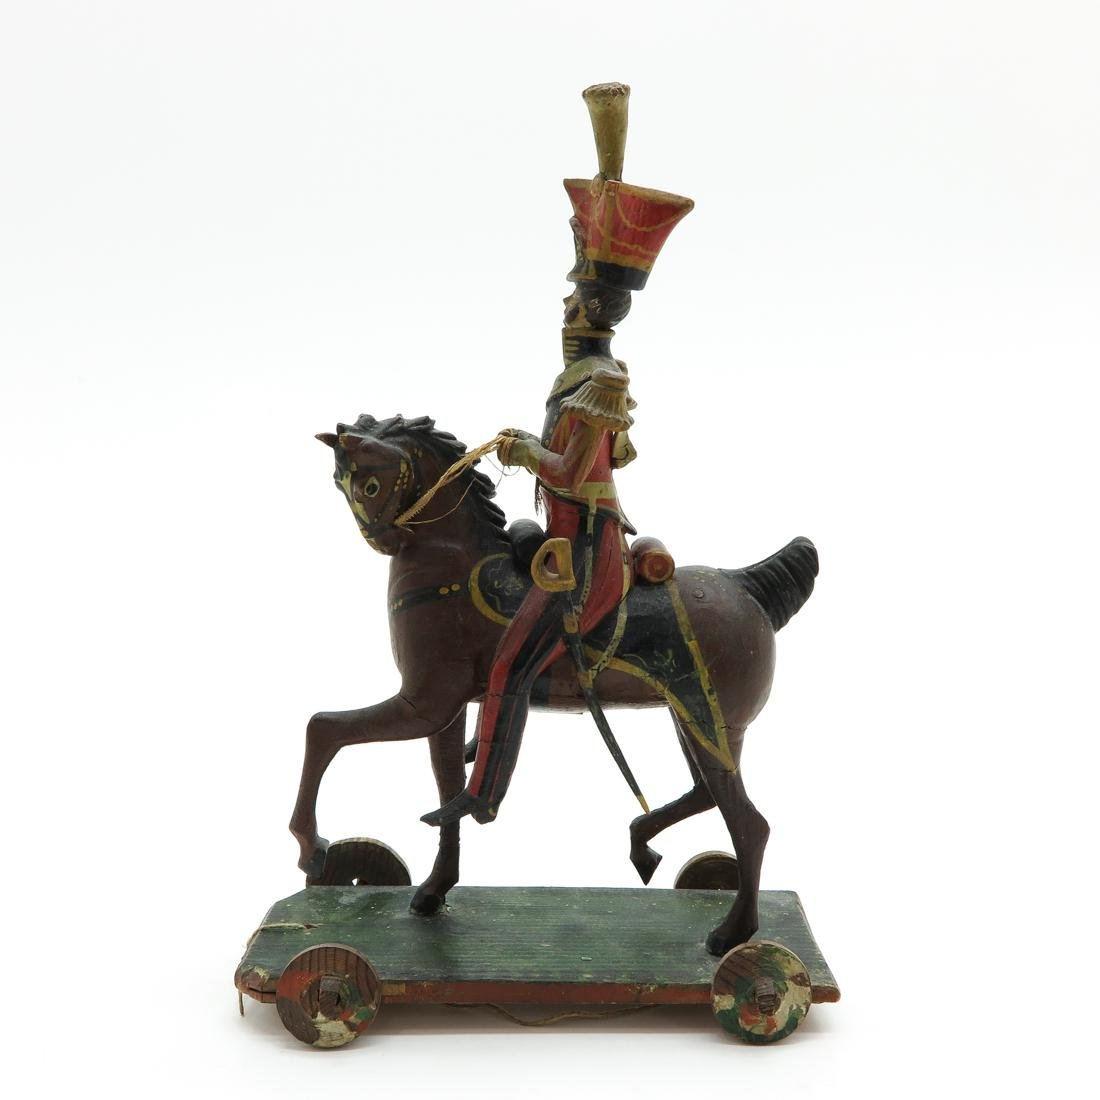 Vintage Pull Toy of Napoleon on Horseback